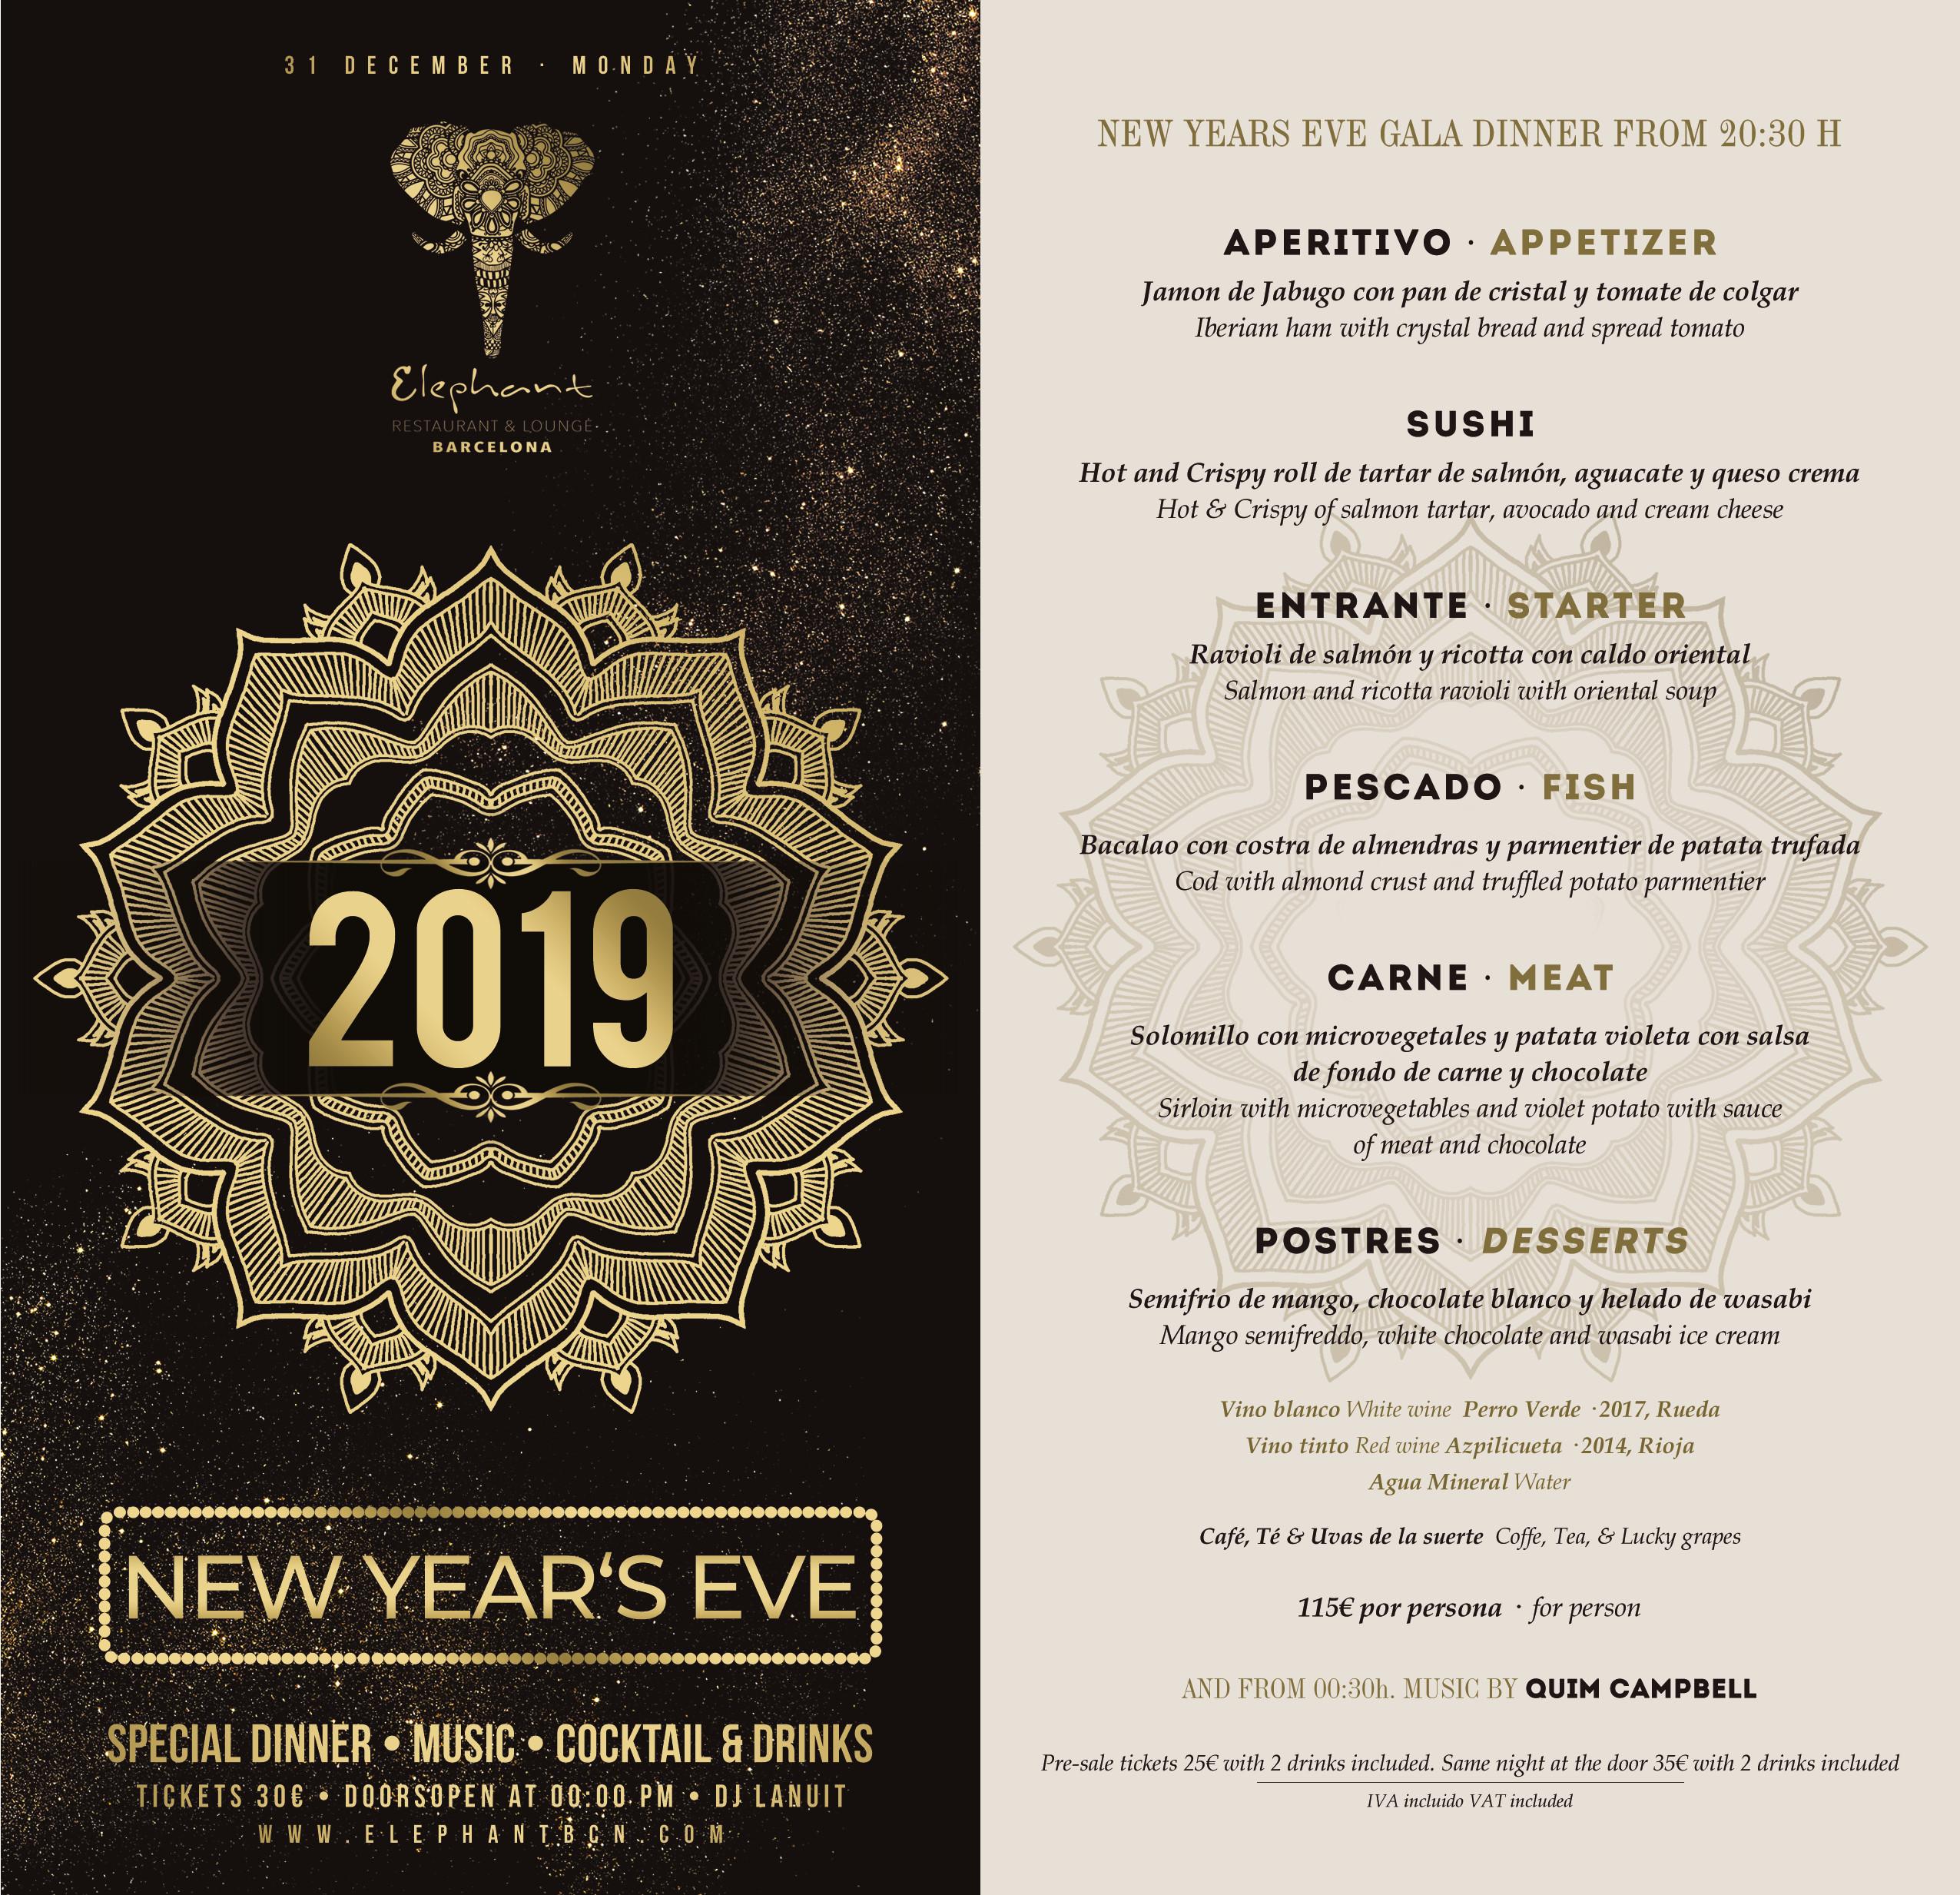 AÑO NUEVO 2019 - ELEPHANT ELEPHANT RESTAURANT & LOUNGE CLUB